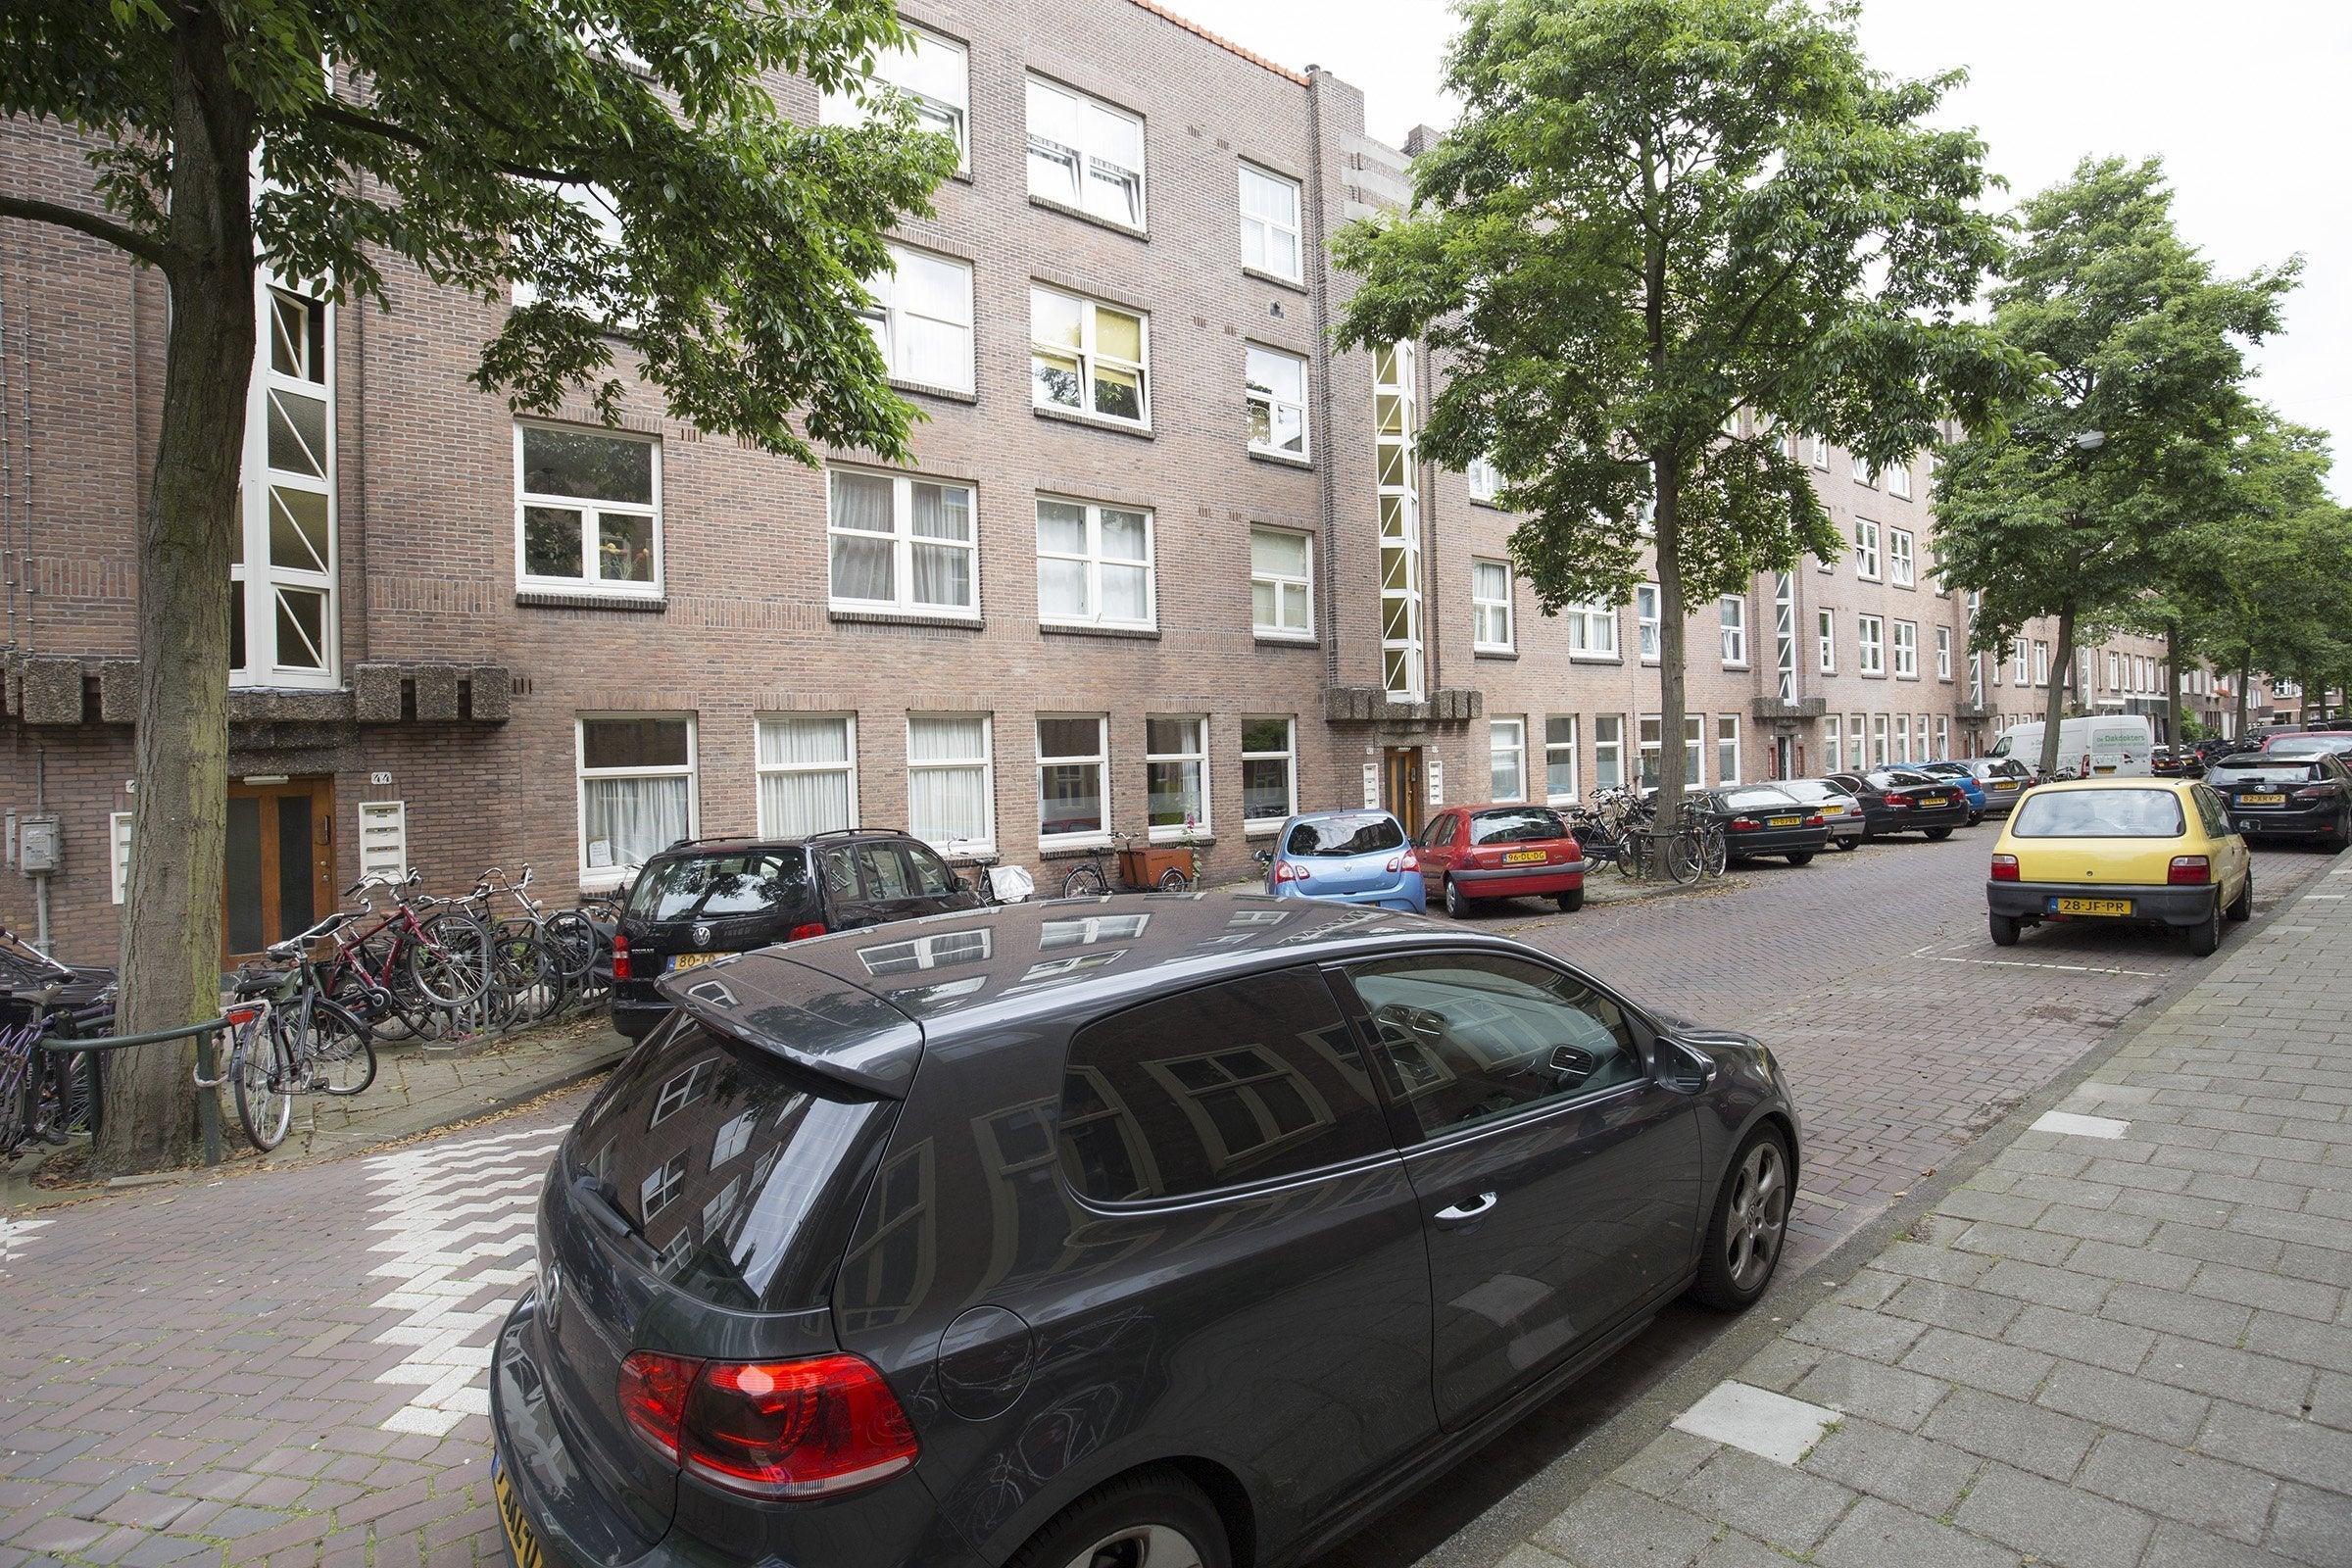 https://public.parariusoffice.nl/15/photos/huge/51298111.1500644157-482.jpg